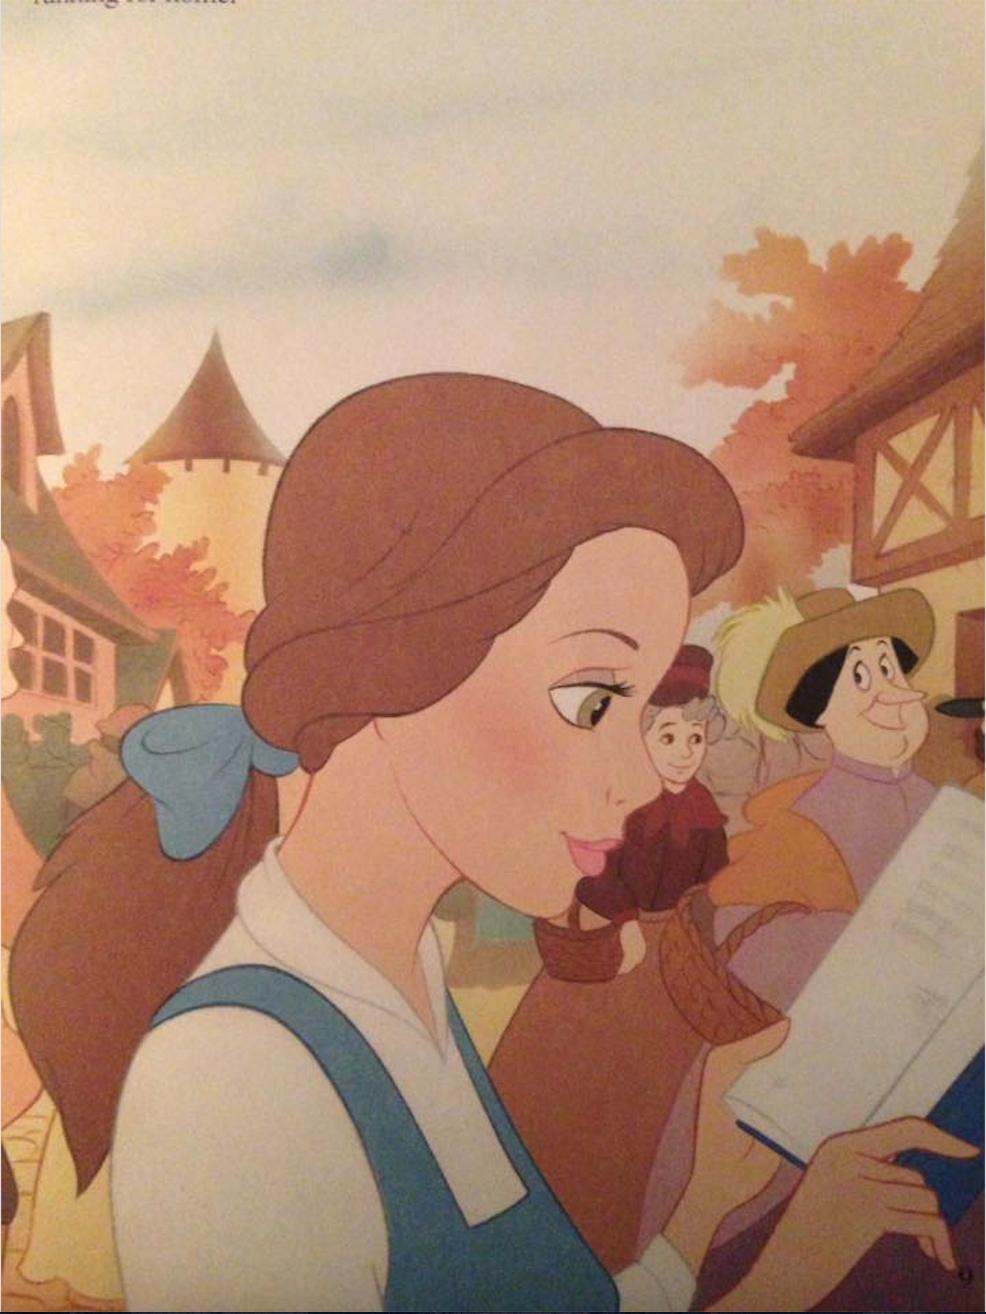 Belle Reading Her Book In The Village 美女と野獣 画 ディズニー